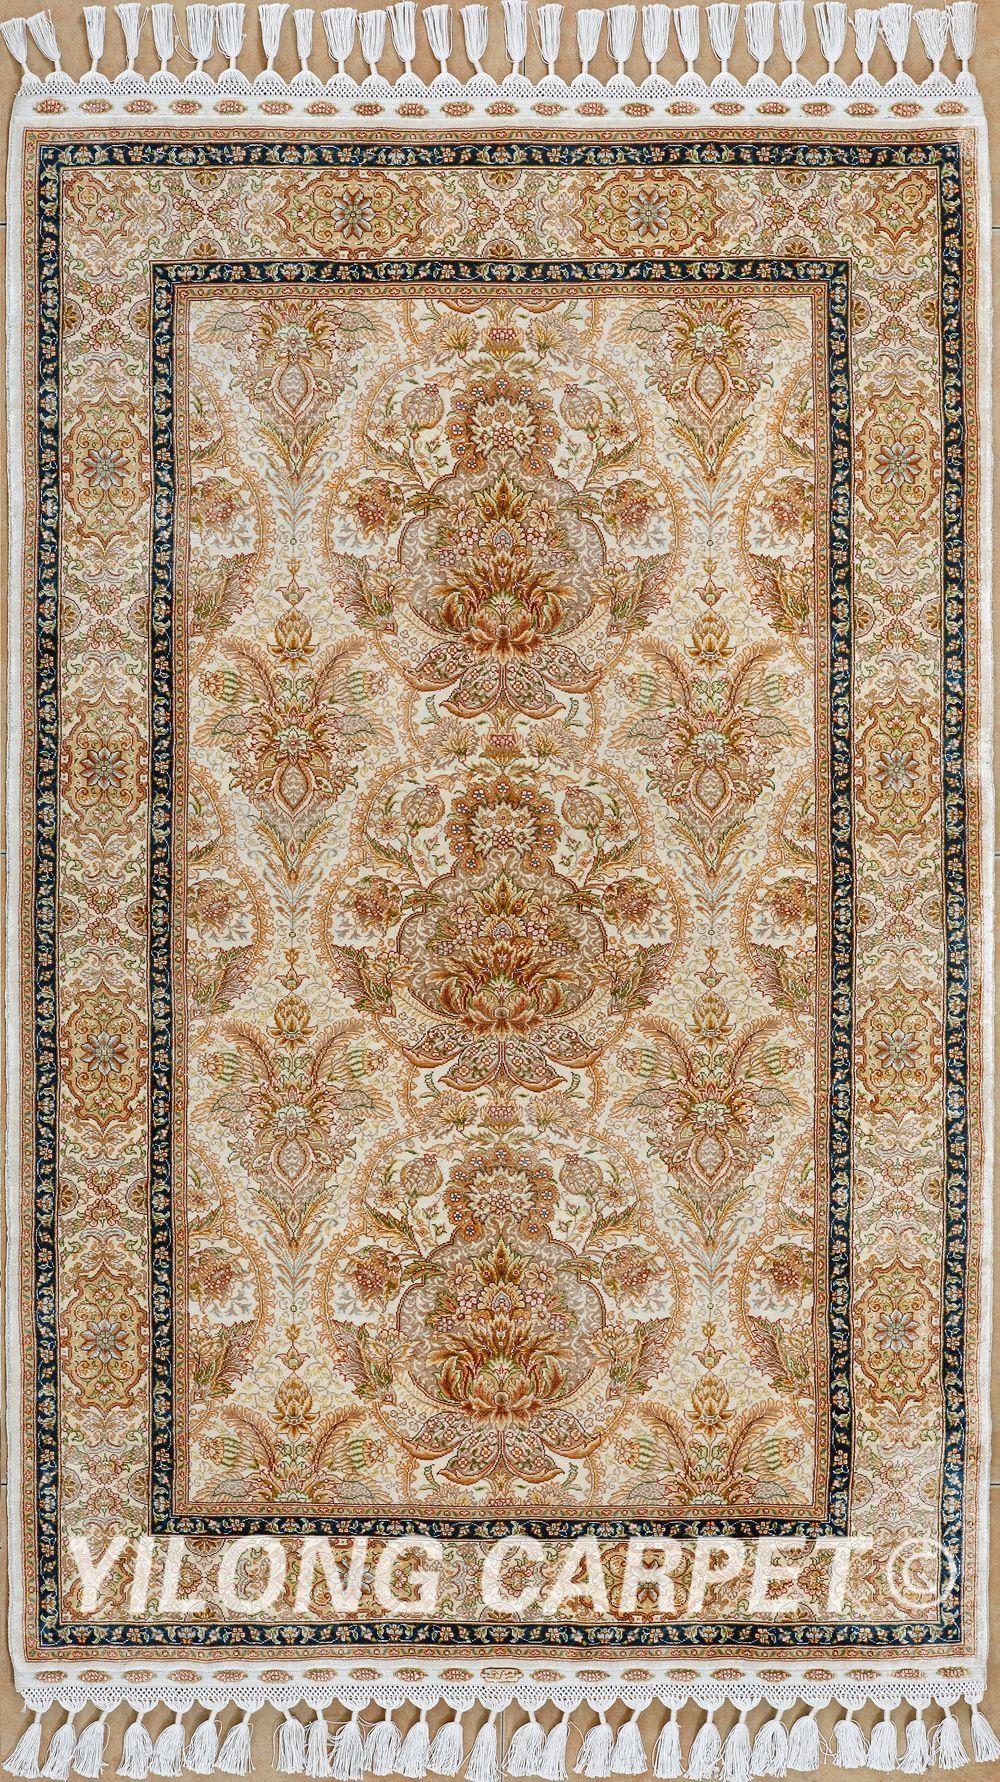 Yellow Persian Rugs Pure Silk Carpet Price Materials Silk Technology Hand Knotted Size 2 X3 14 X20 Design Silk Area Rugs Carpet Handmade Geometric Rug